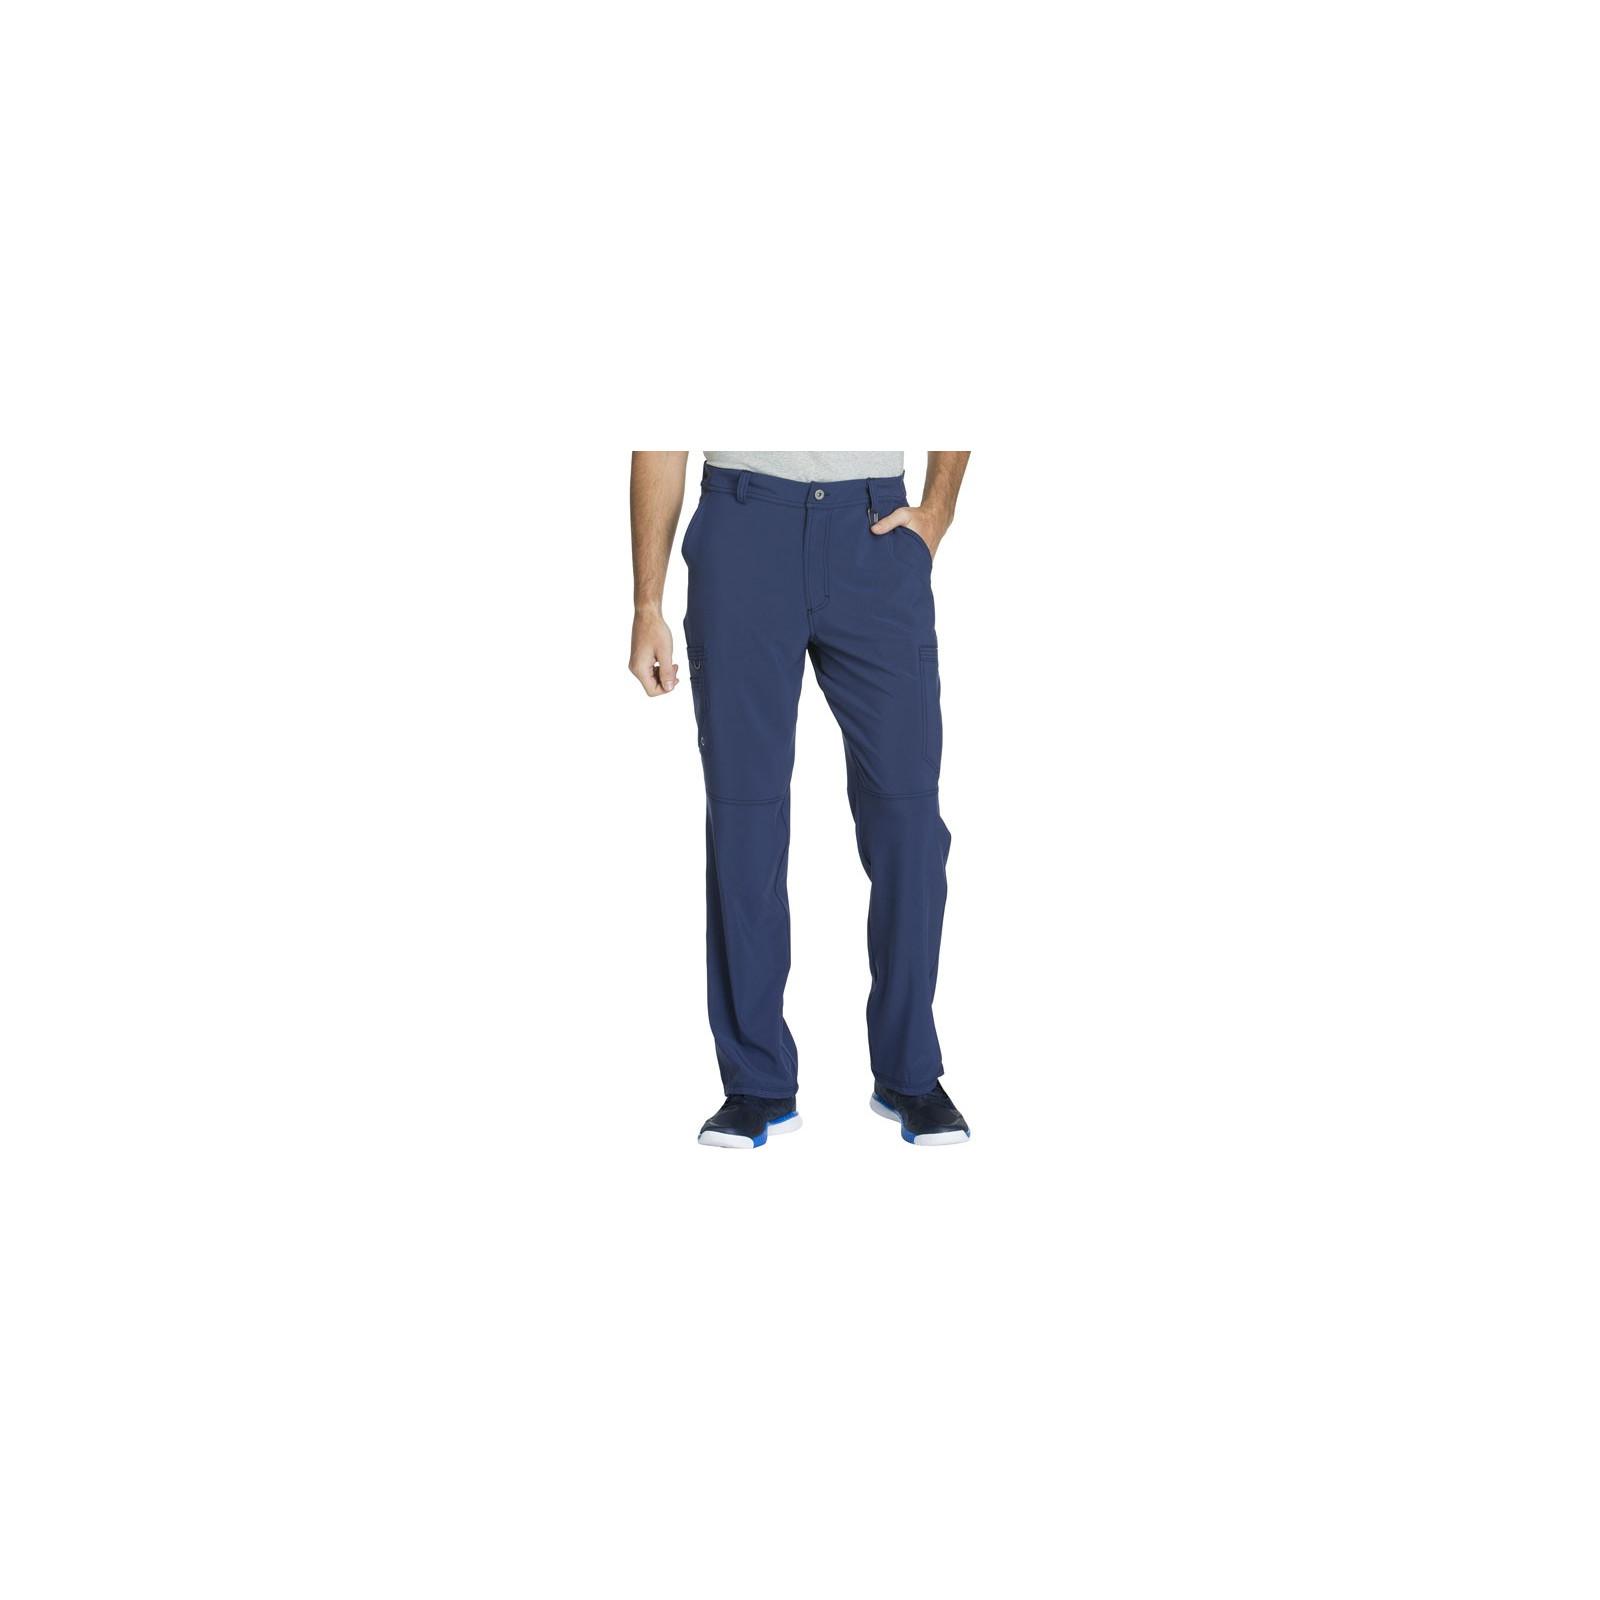 "Pantalon à bouton homme, Cherokee, Collection ""Infinity"" (CK200A) bleu marine face"